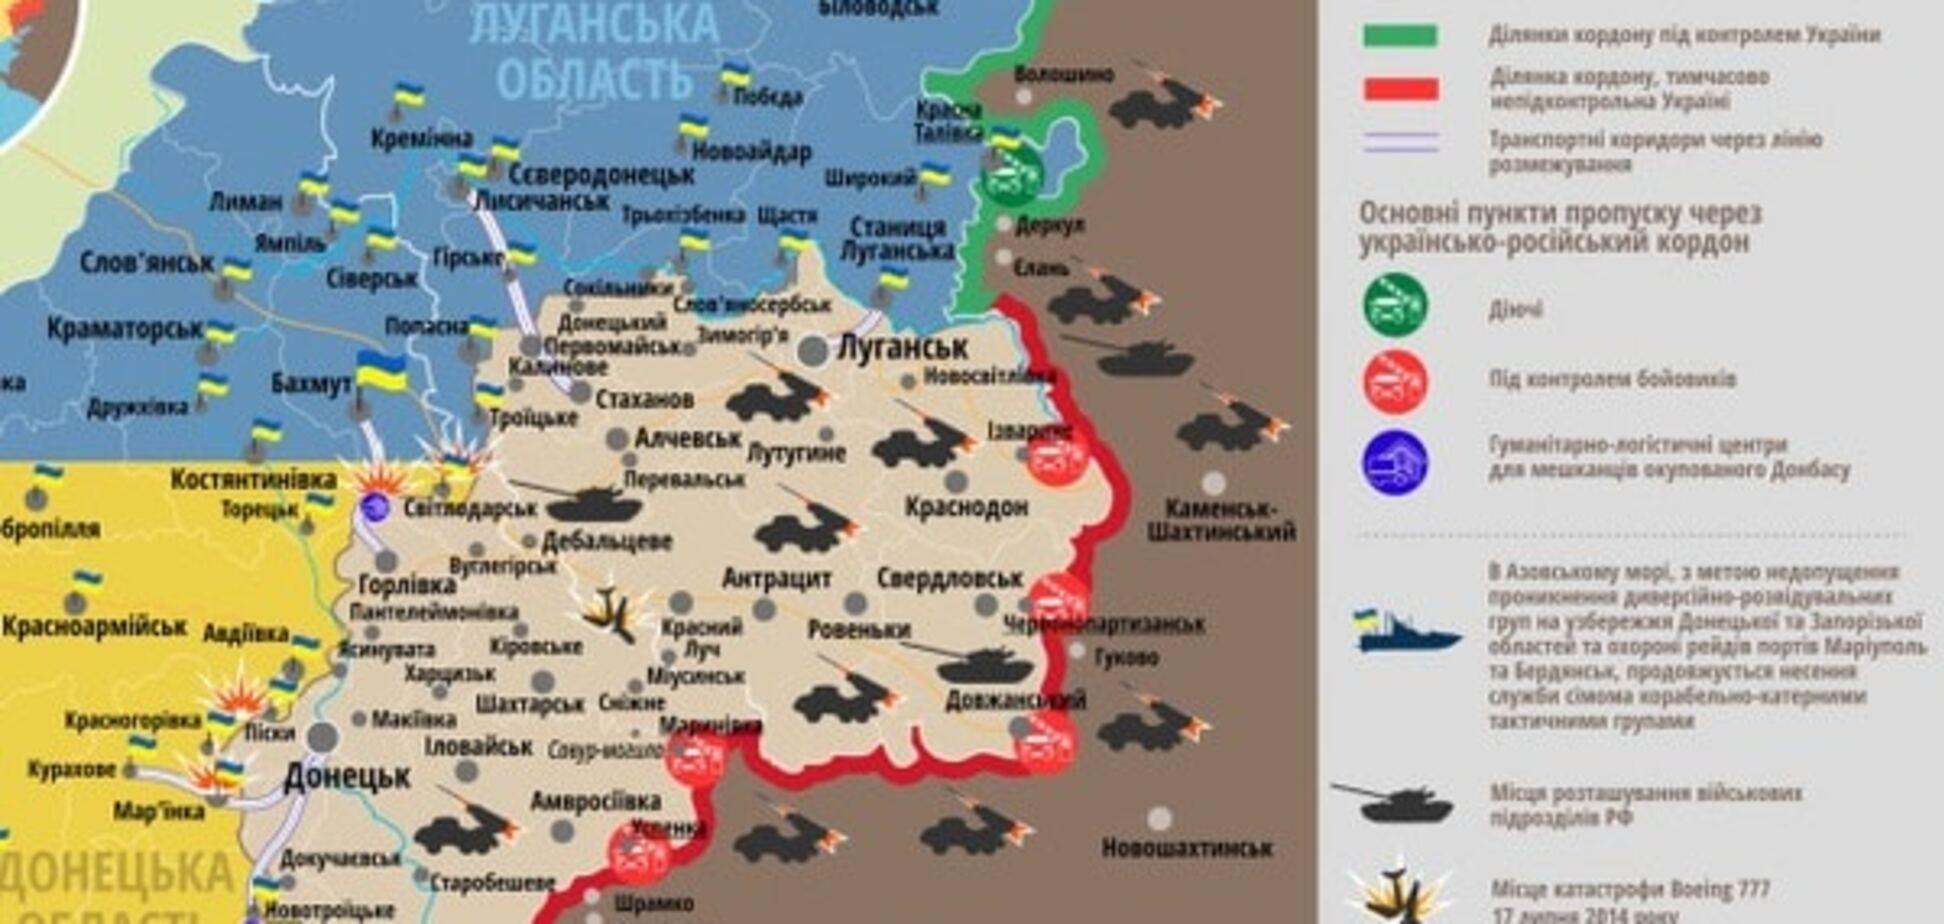 Один український боєць поранений за добу 'перемир'я': карта АТО